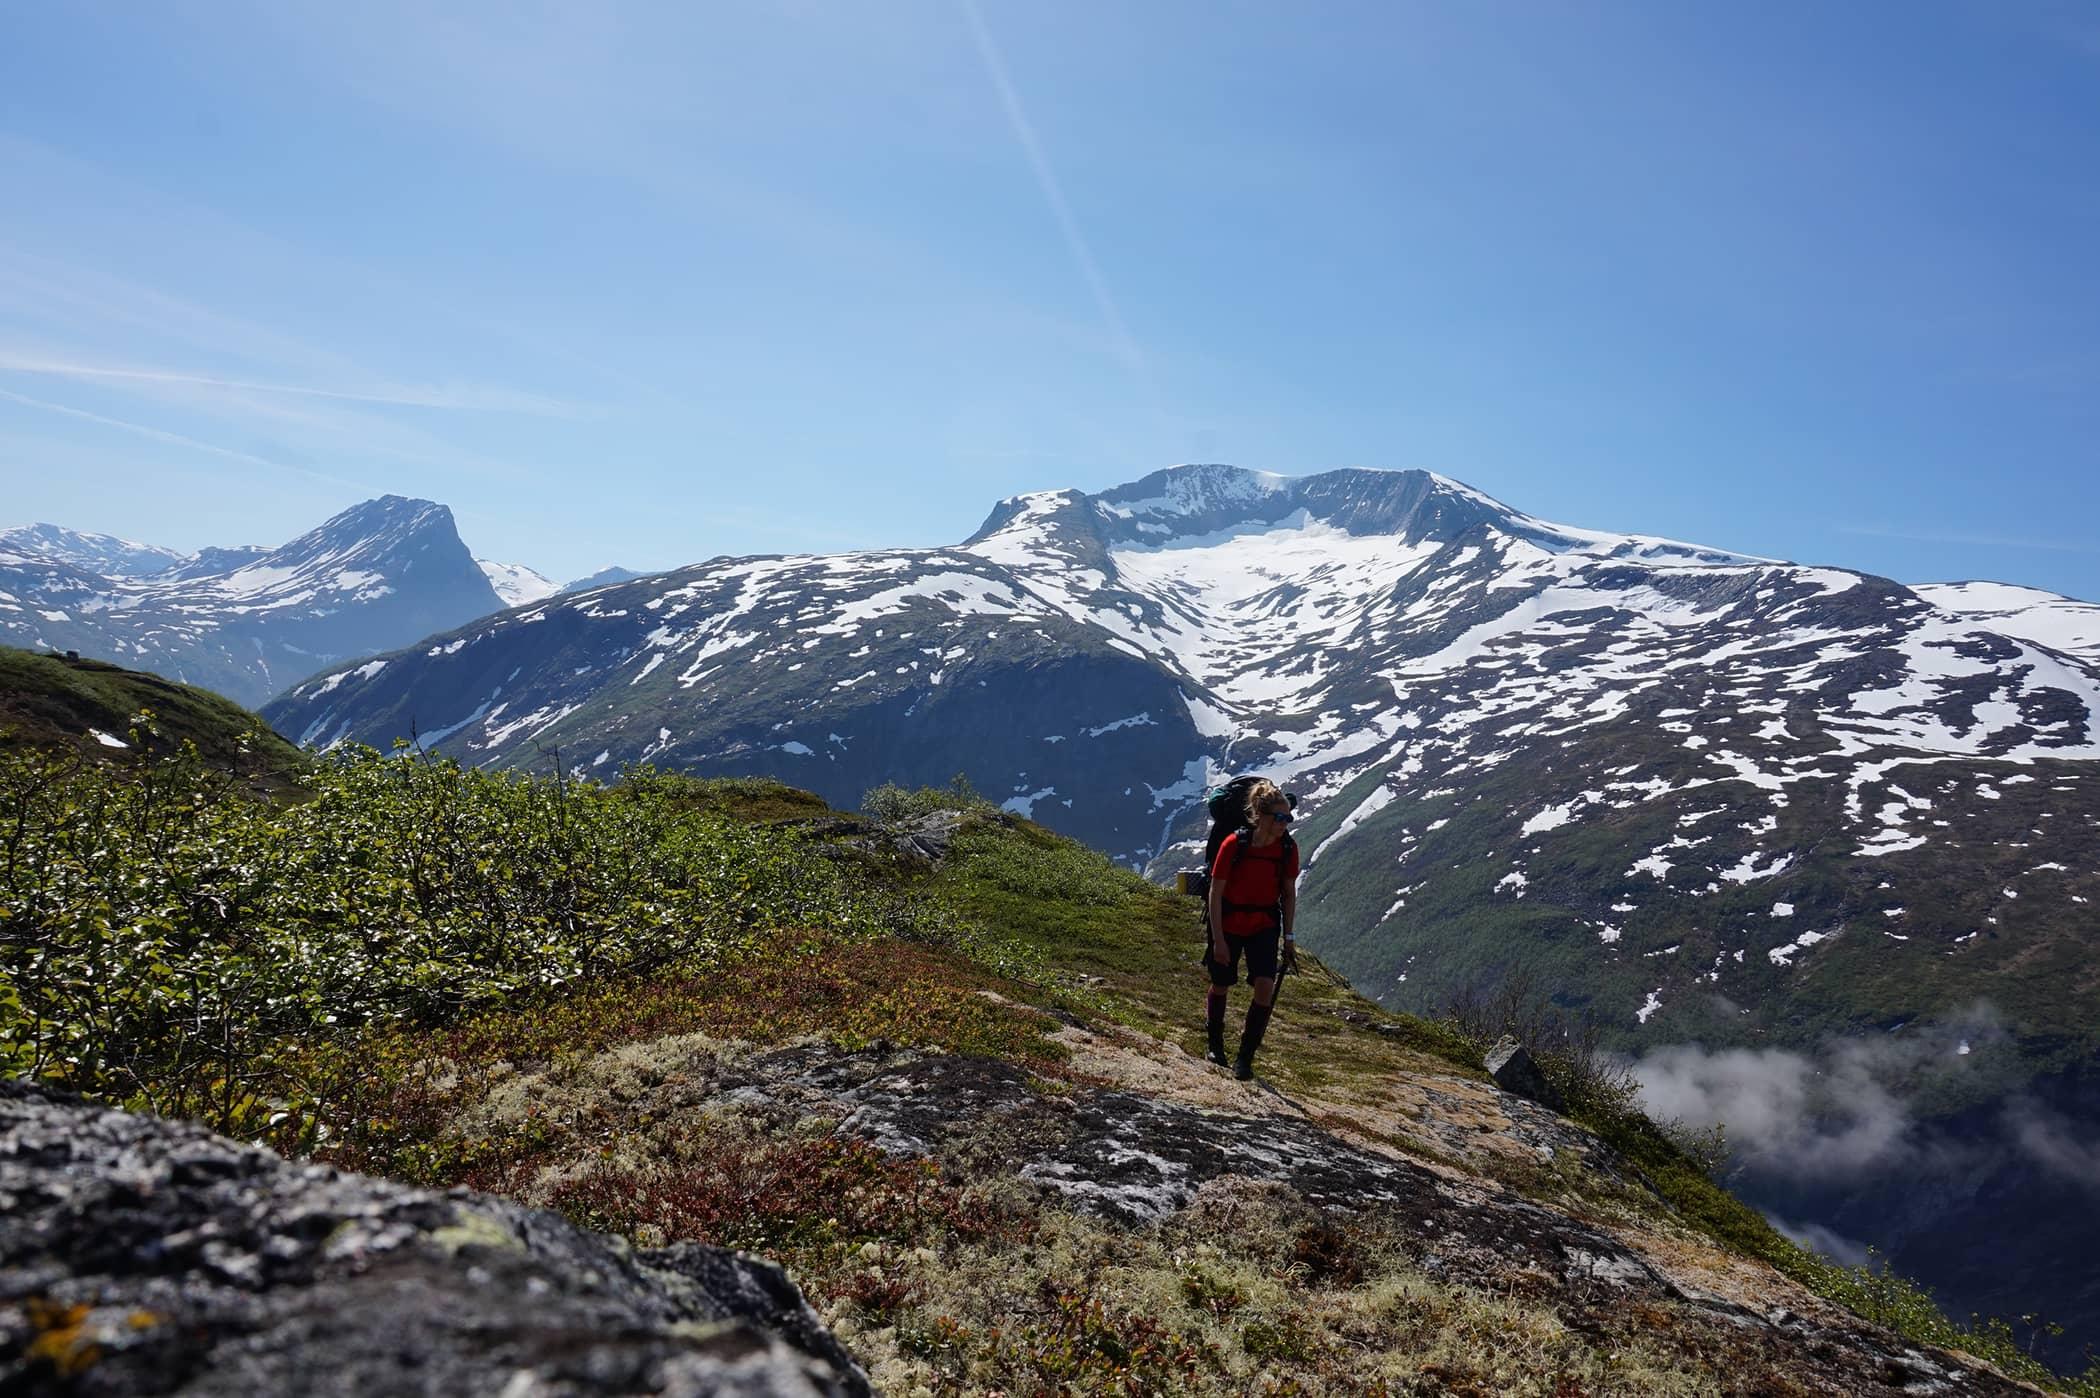 Tafjordfjella_Britt-Ingunn-Tafjord-Walle-4.jpg